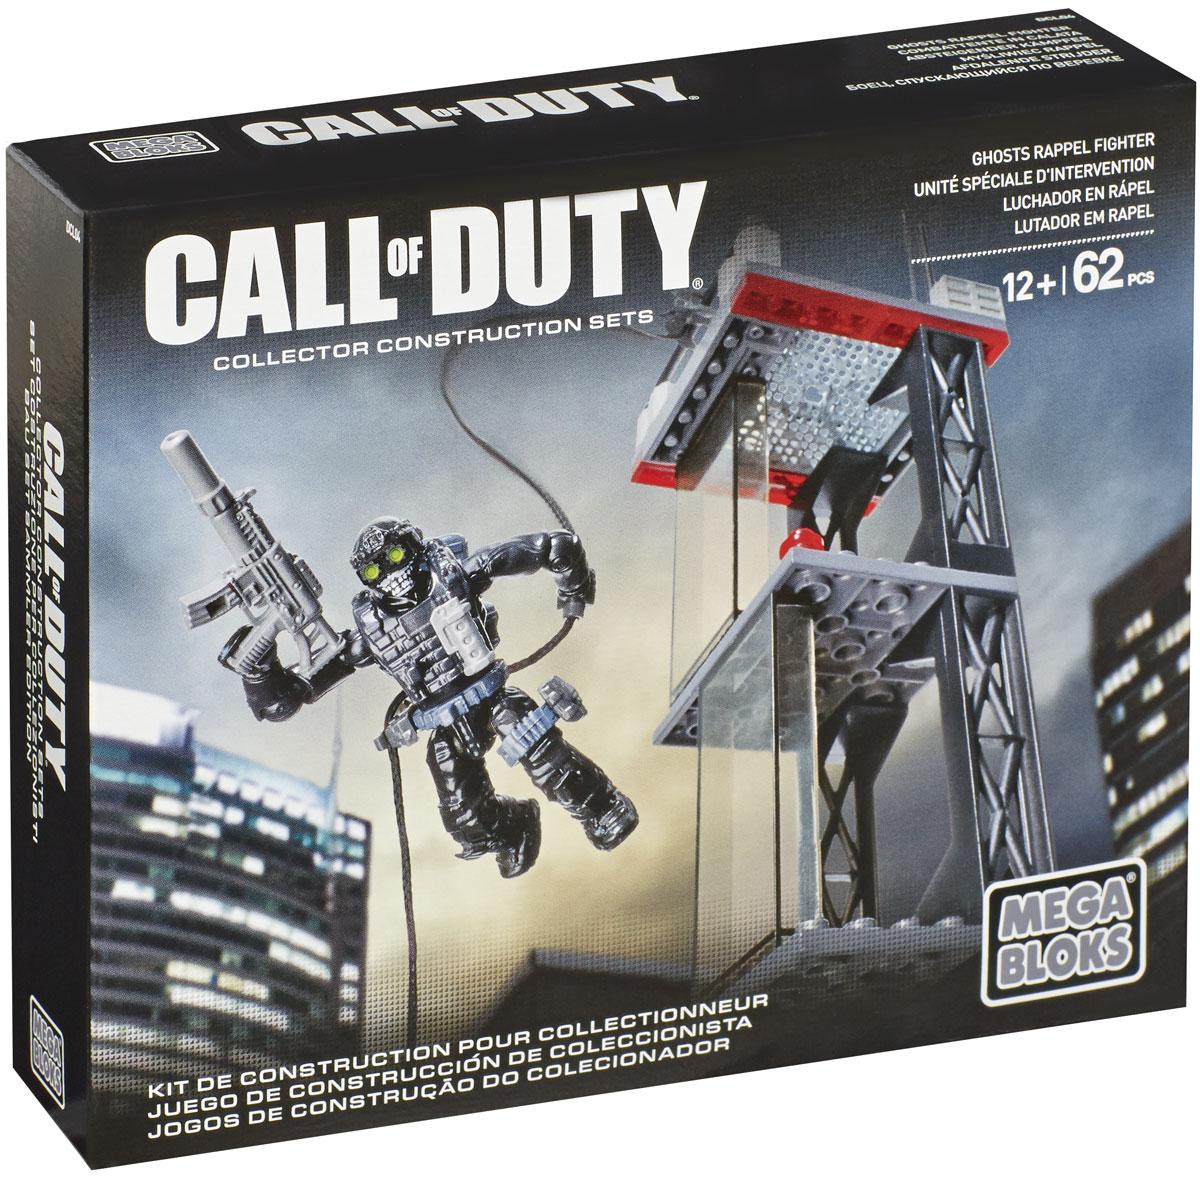 Mega Bloks Call Of Duty Конструктор Ghost Rappel Fighter mega bloks call of duty конструктор ghost rappel fighter